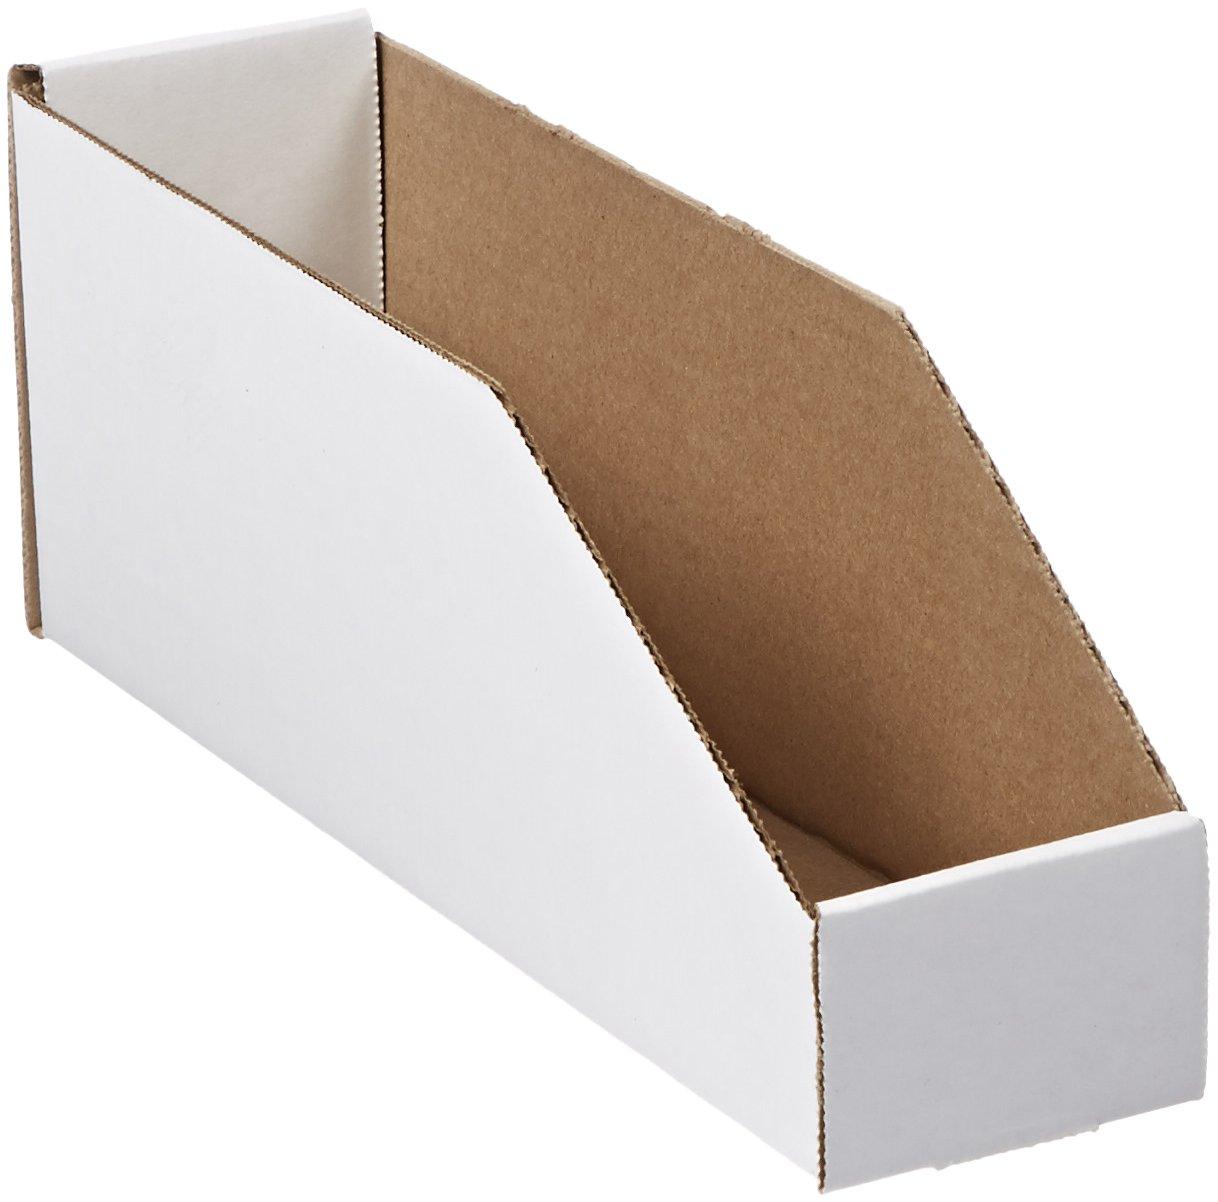 Aviditi Corrugated Cardboard Storage Bins, 3